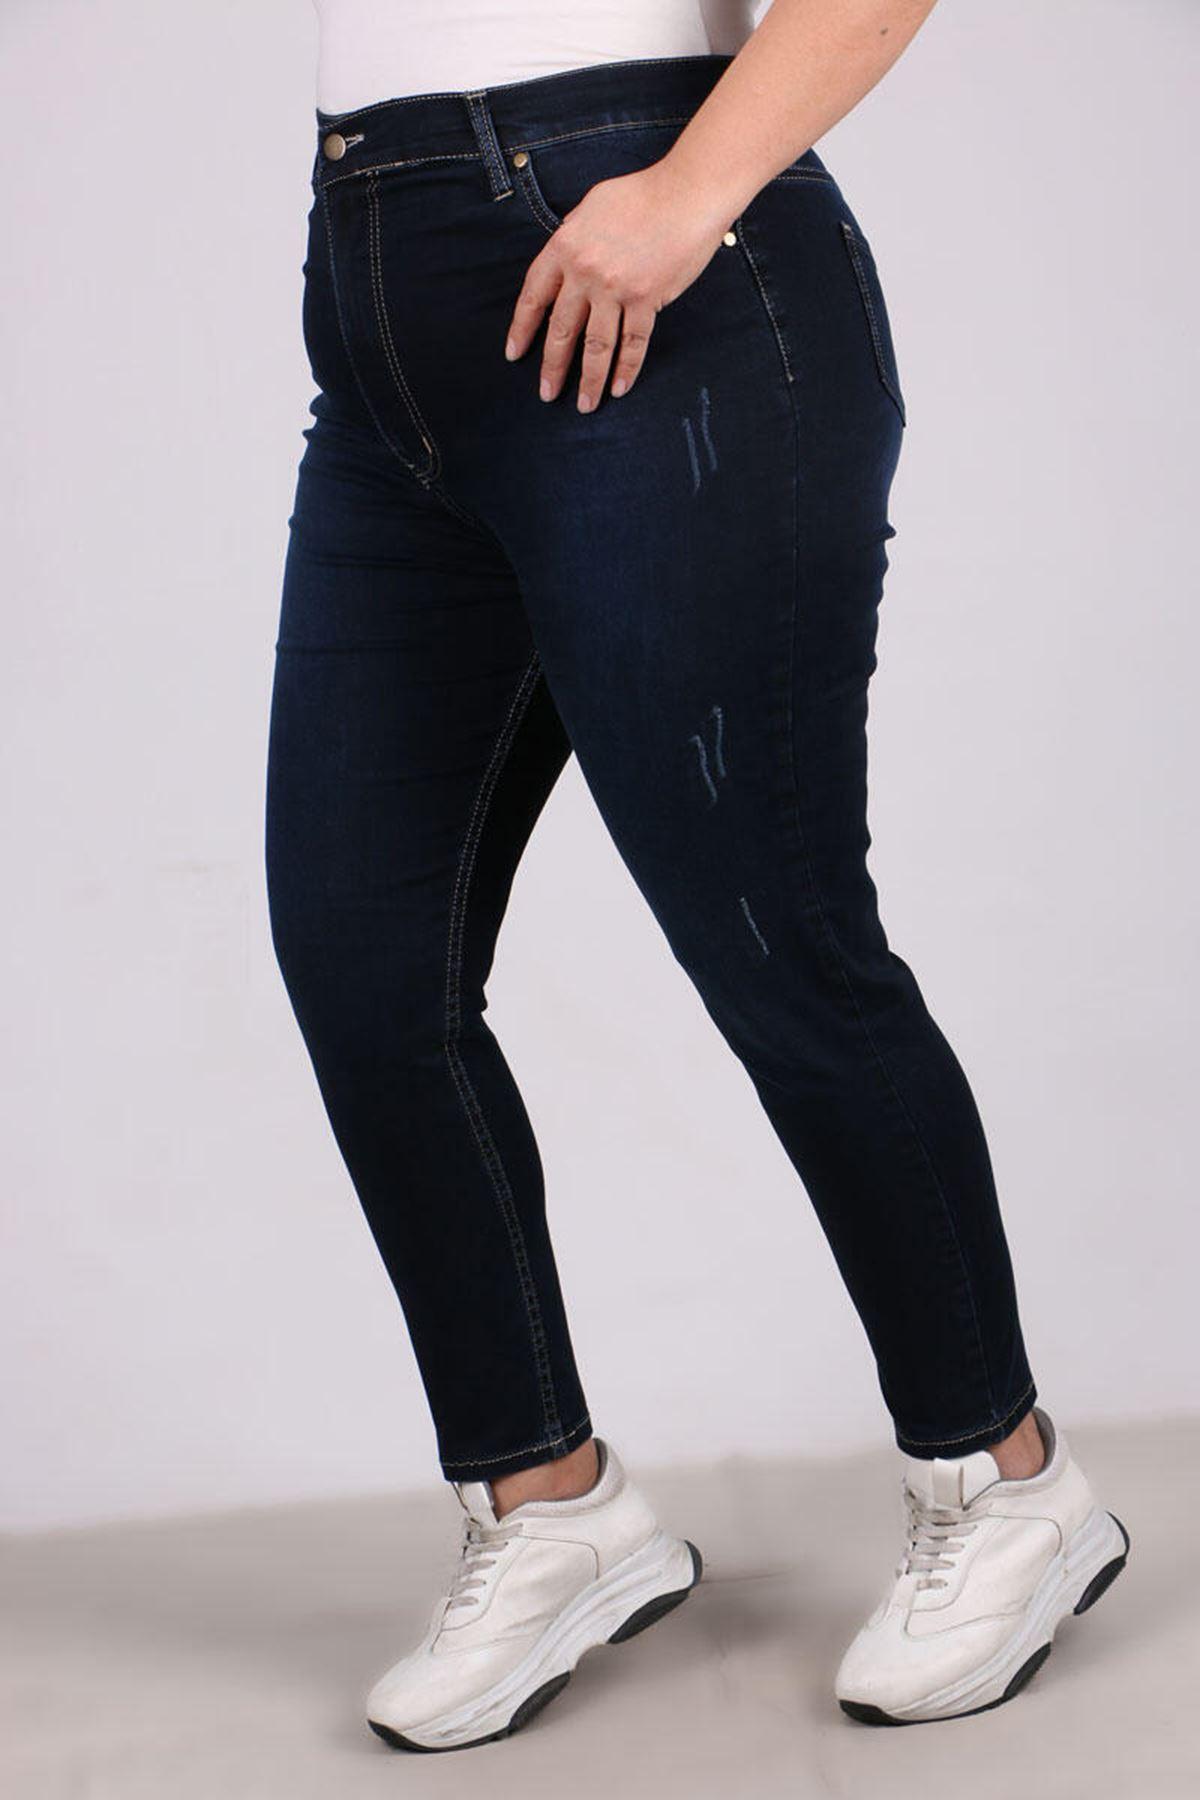 9117-1 Plus Size Skinny Leg Jeans - Dark Navy Blue